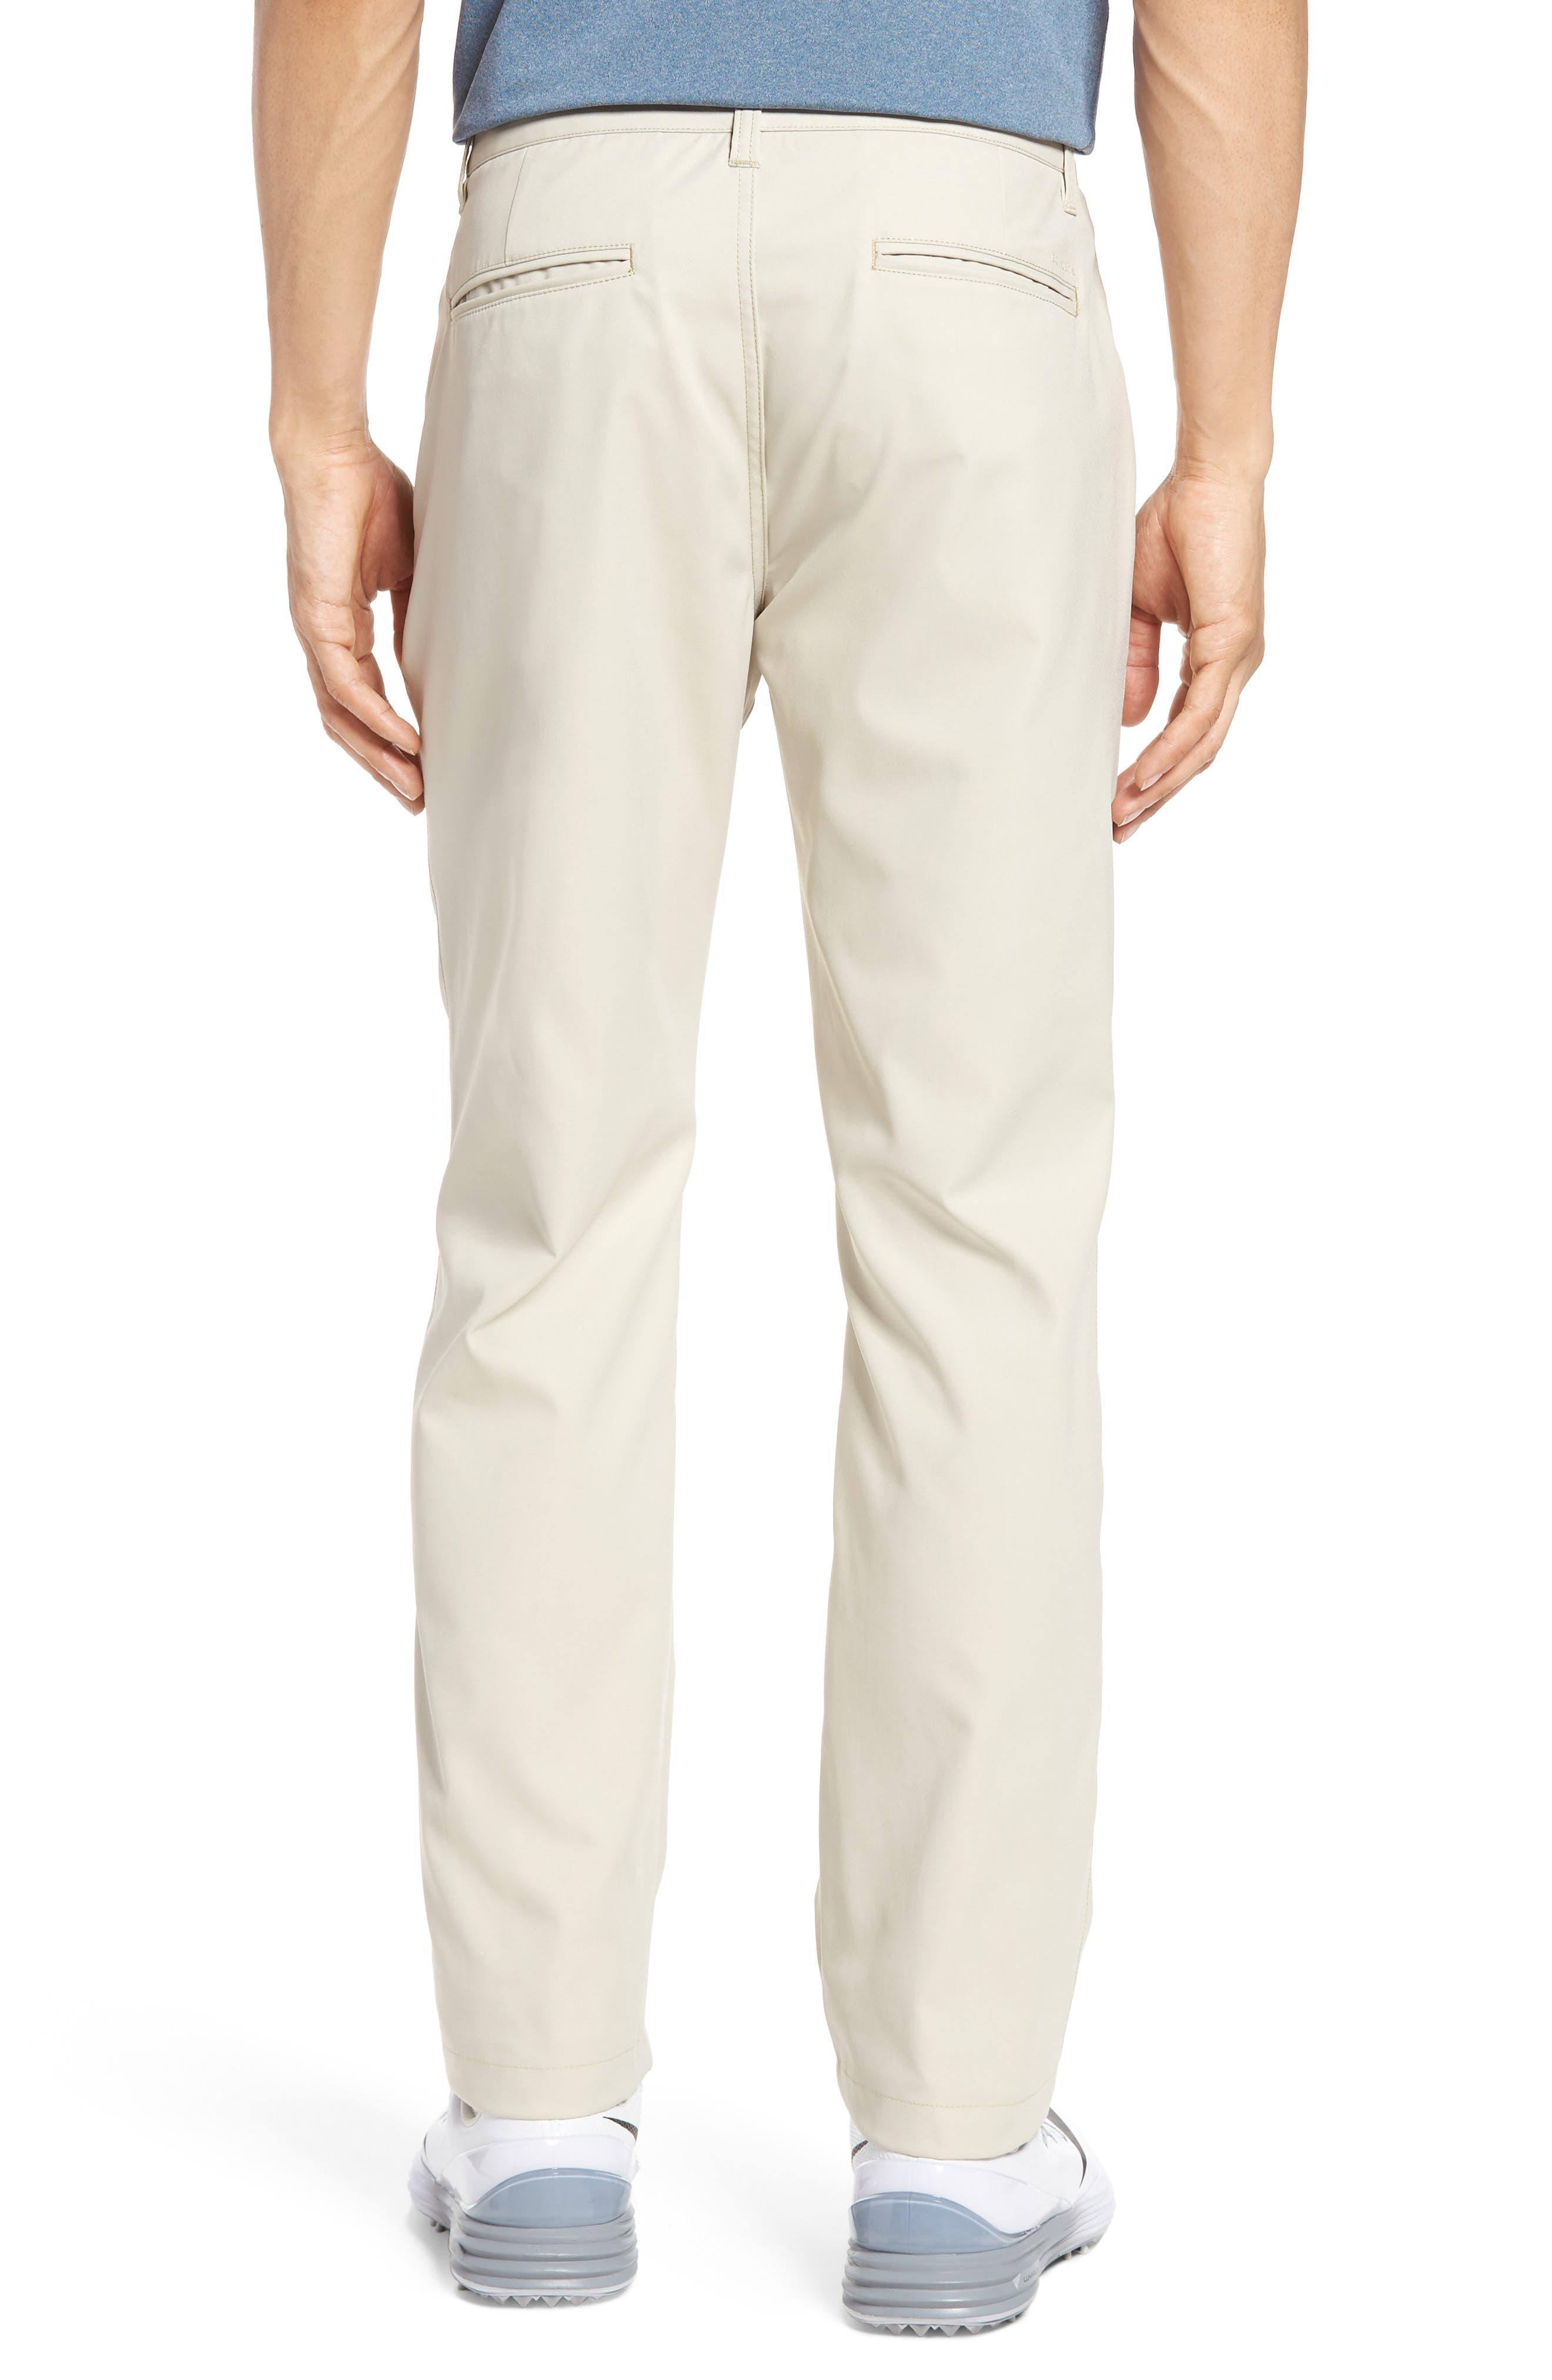 Highland Slim Fit Golf Pants,                             Alternate thumbnail 2, color,                             STONE